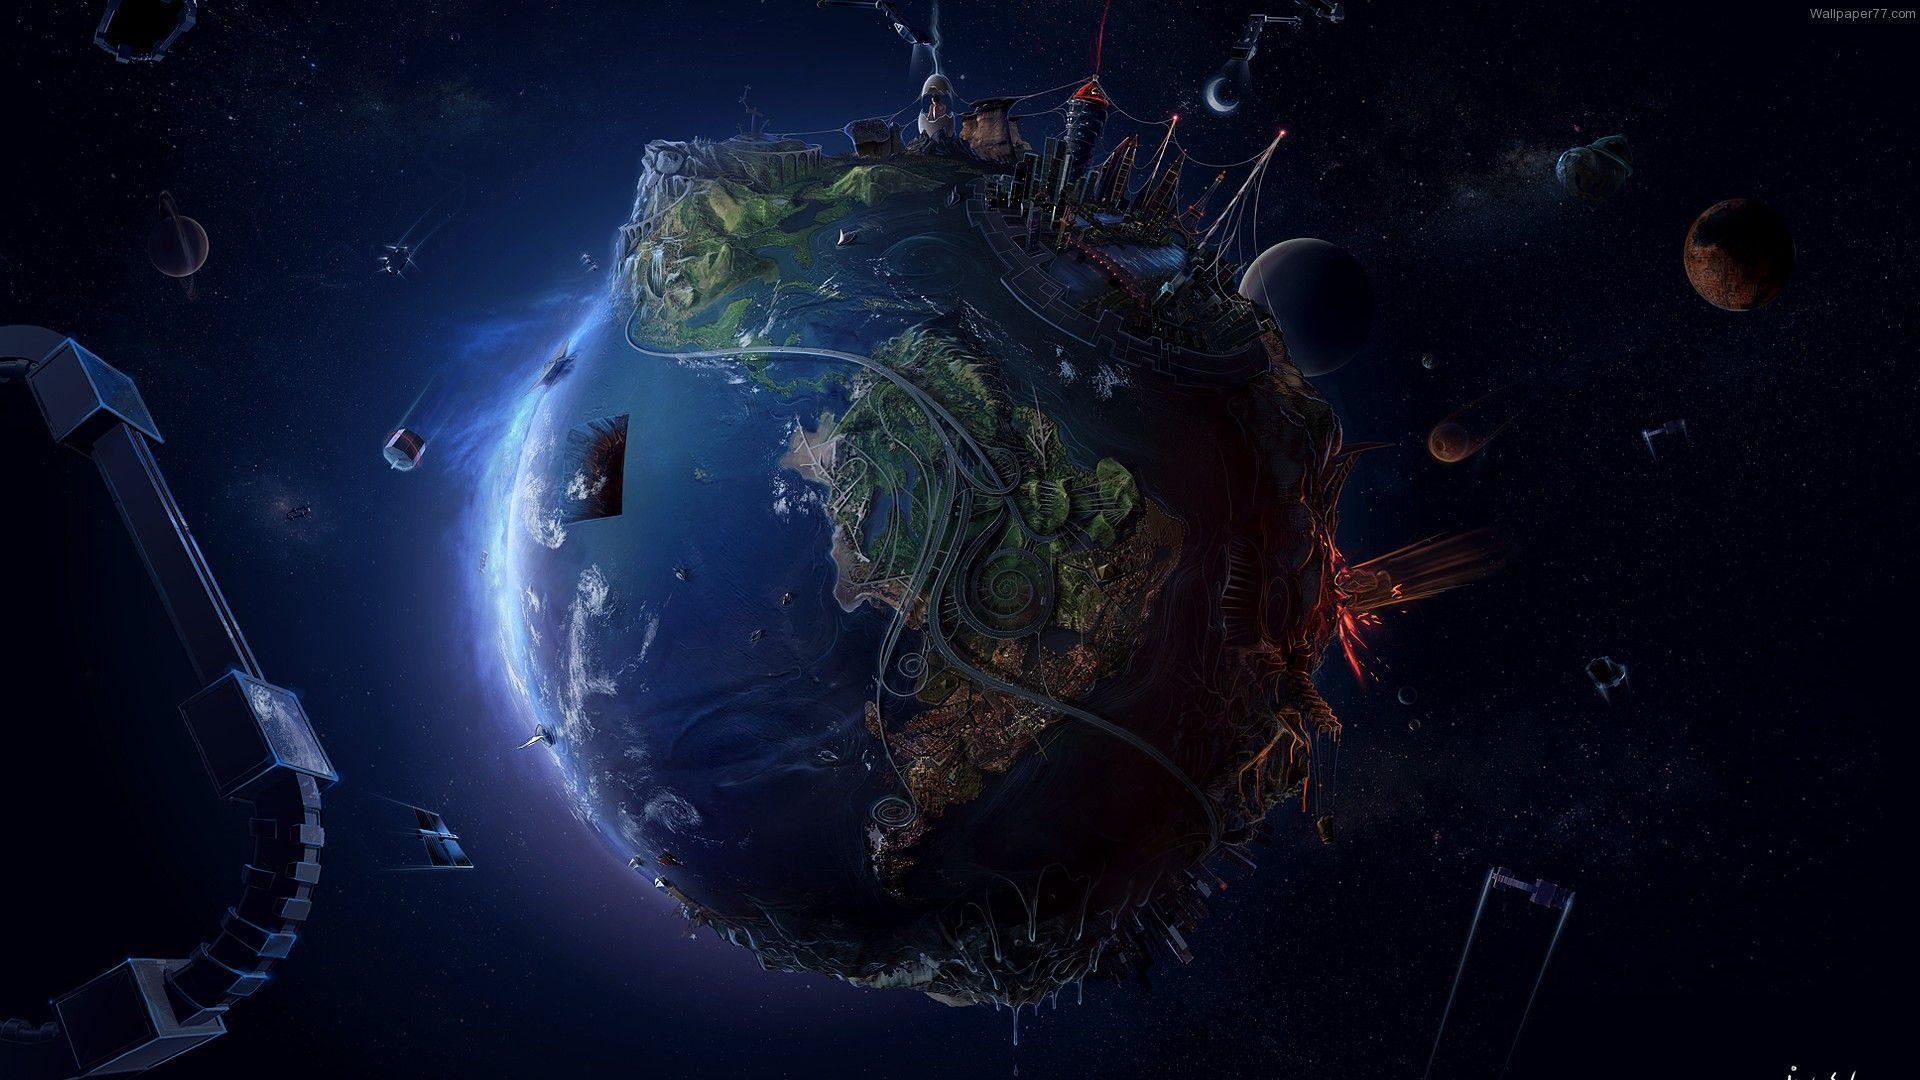 stargazer satellite desktop wallpaper wallpaper - photo #26